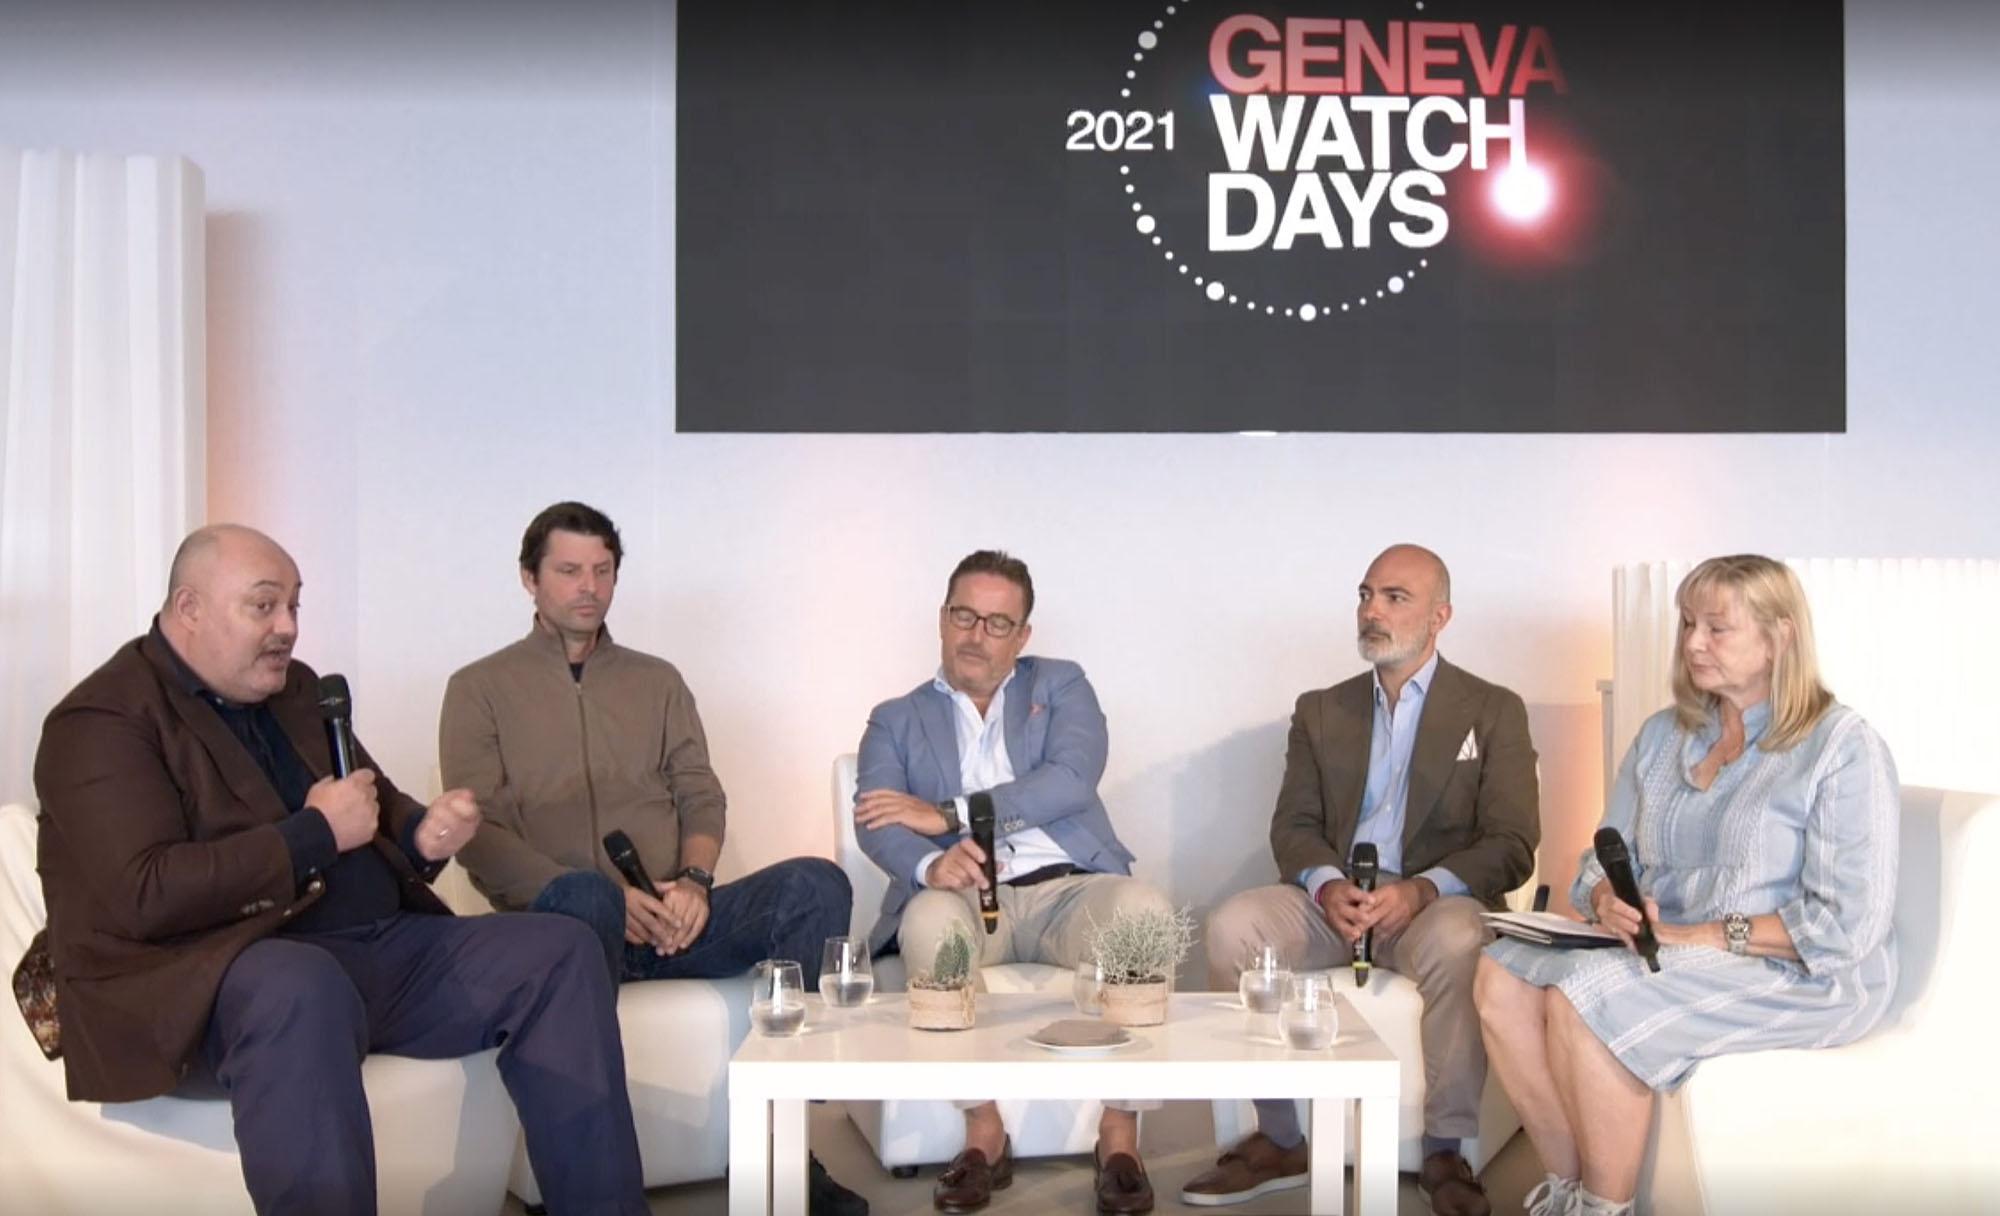 Geneva Watch Days GWD 2021 Independent Watchmaking Panel William Massena (Massena Lab), Felix Baumgartner (Urwerk), Pierre Jacques (De Bethune), Alex Ghotbi (Phillips Auctions), Elizabeth Dörr (Quill & Pad)